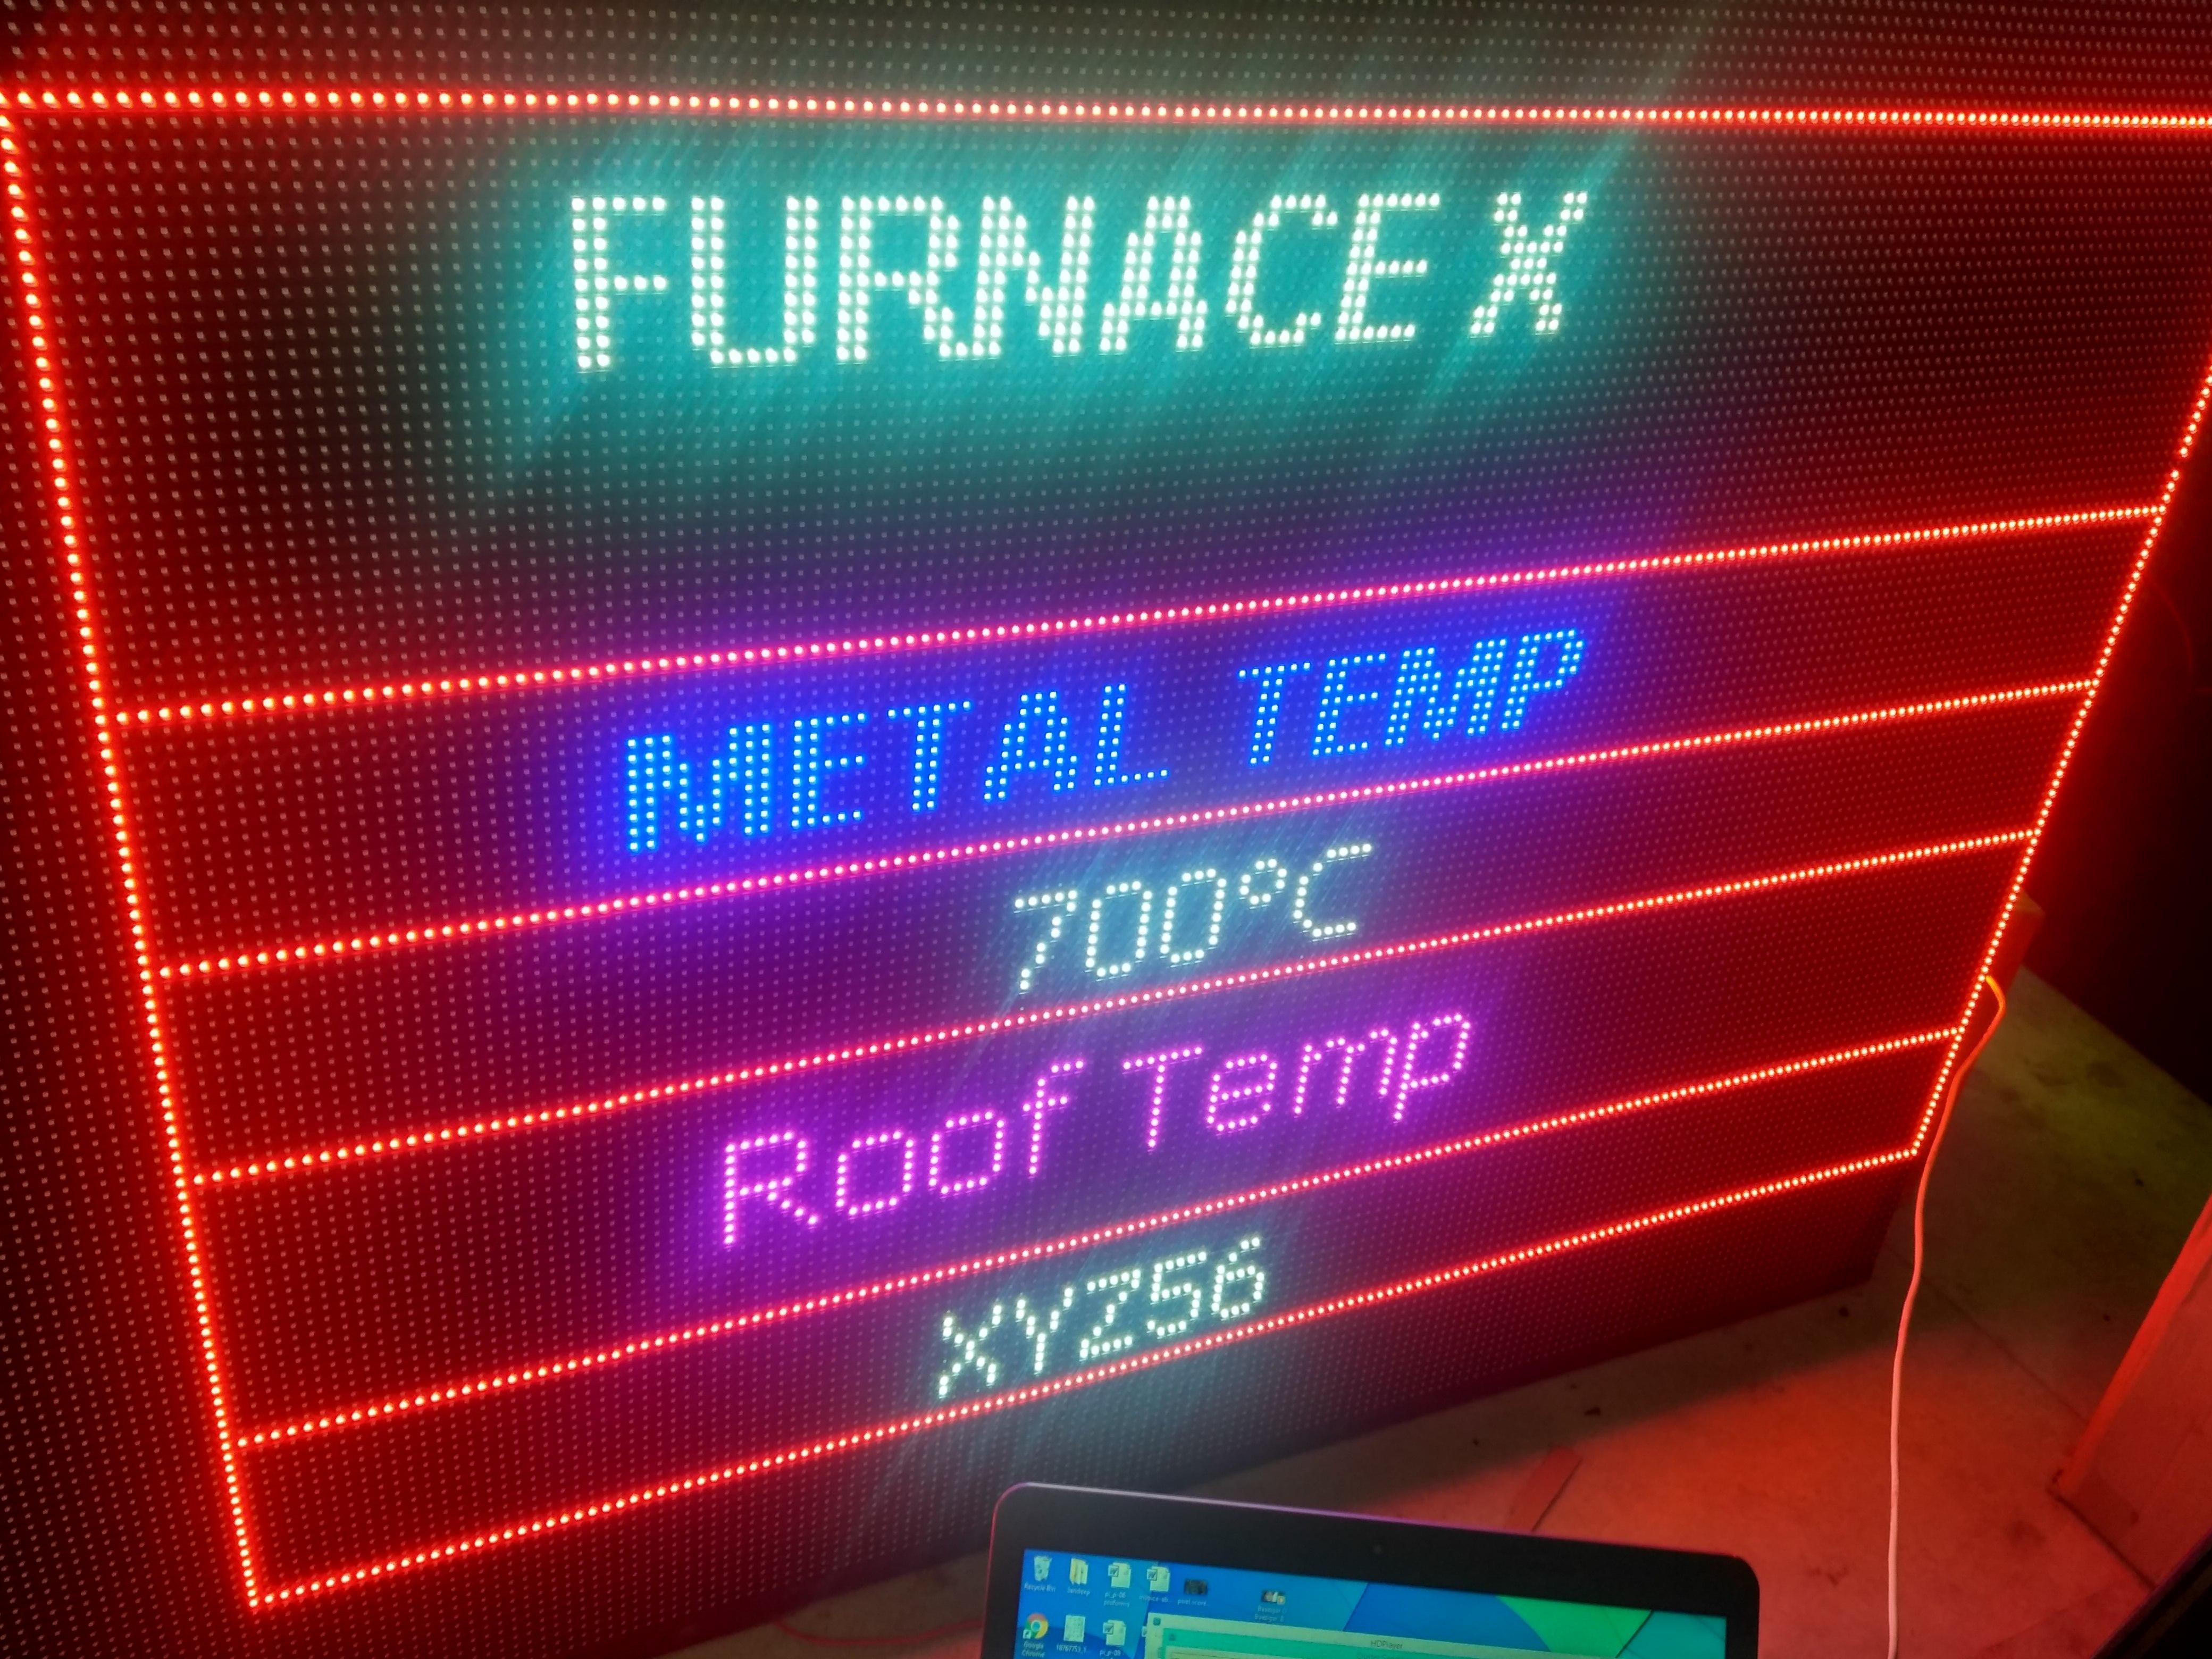 Static LED Display